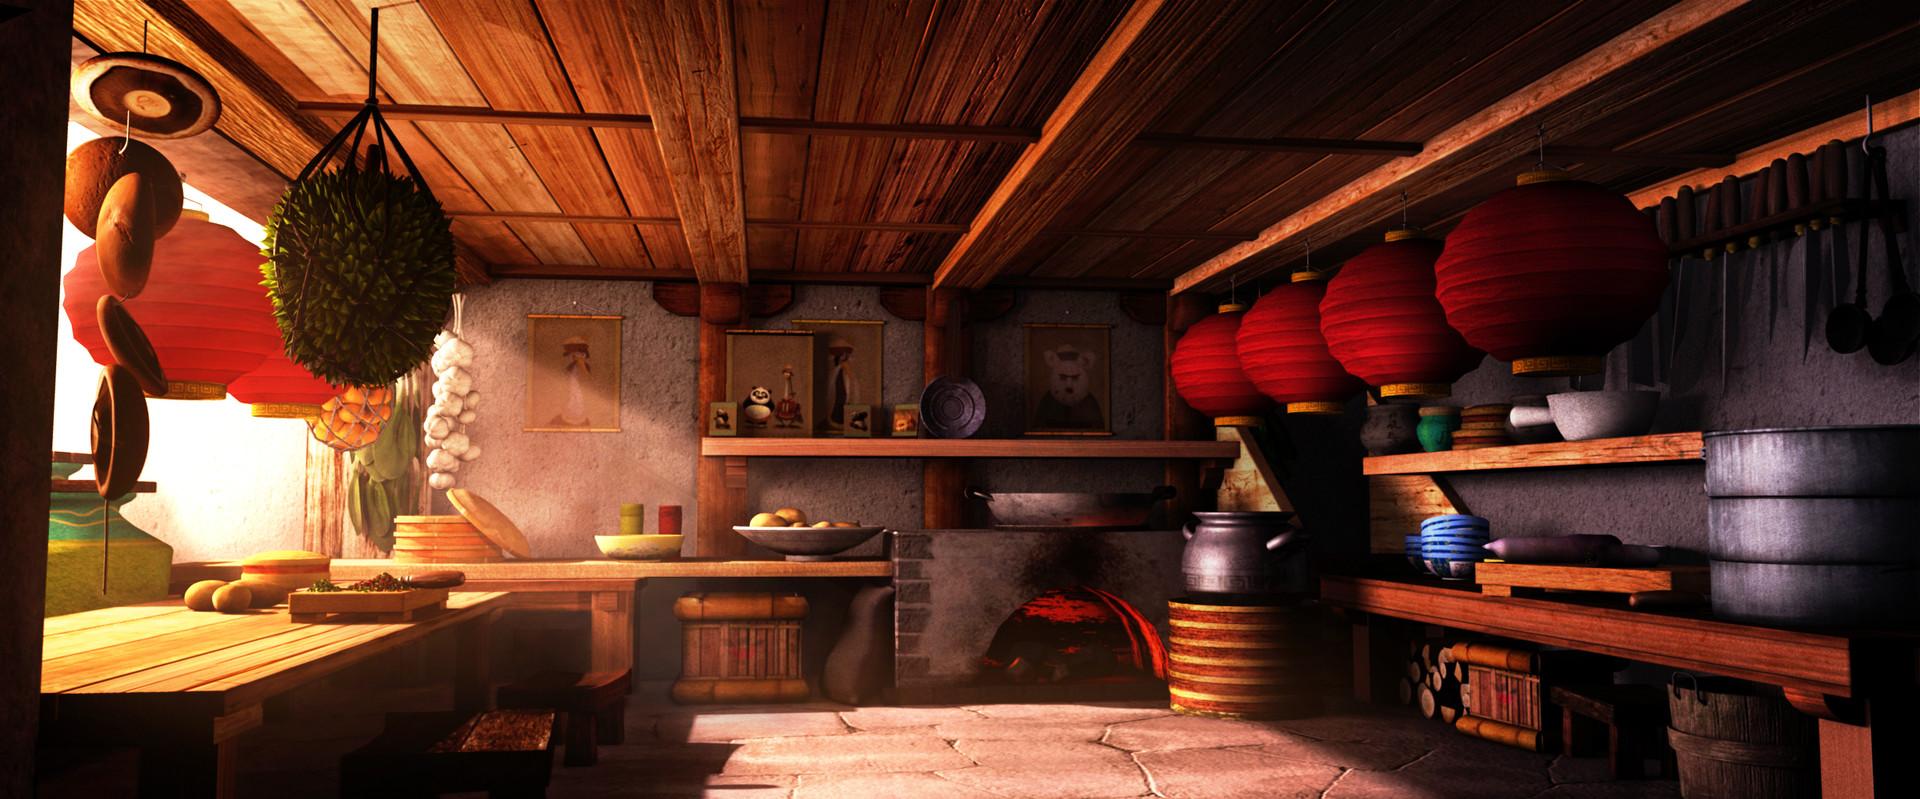 Kung Fu Panda Kitchen Scene